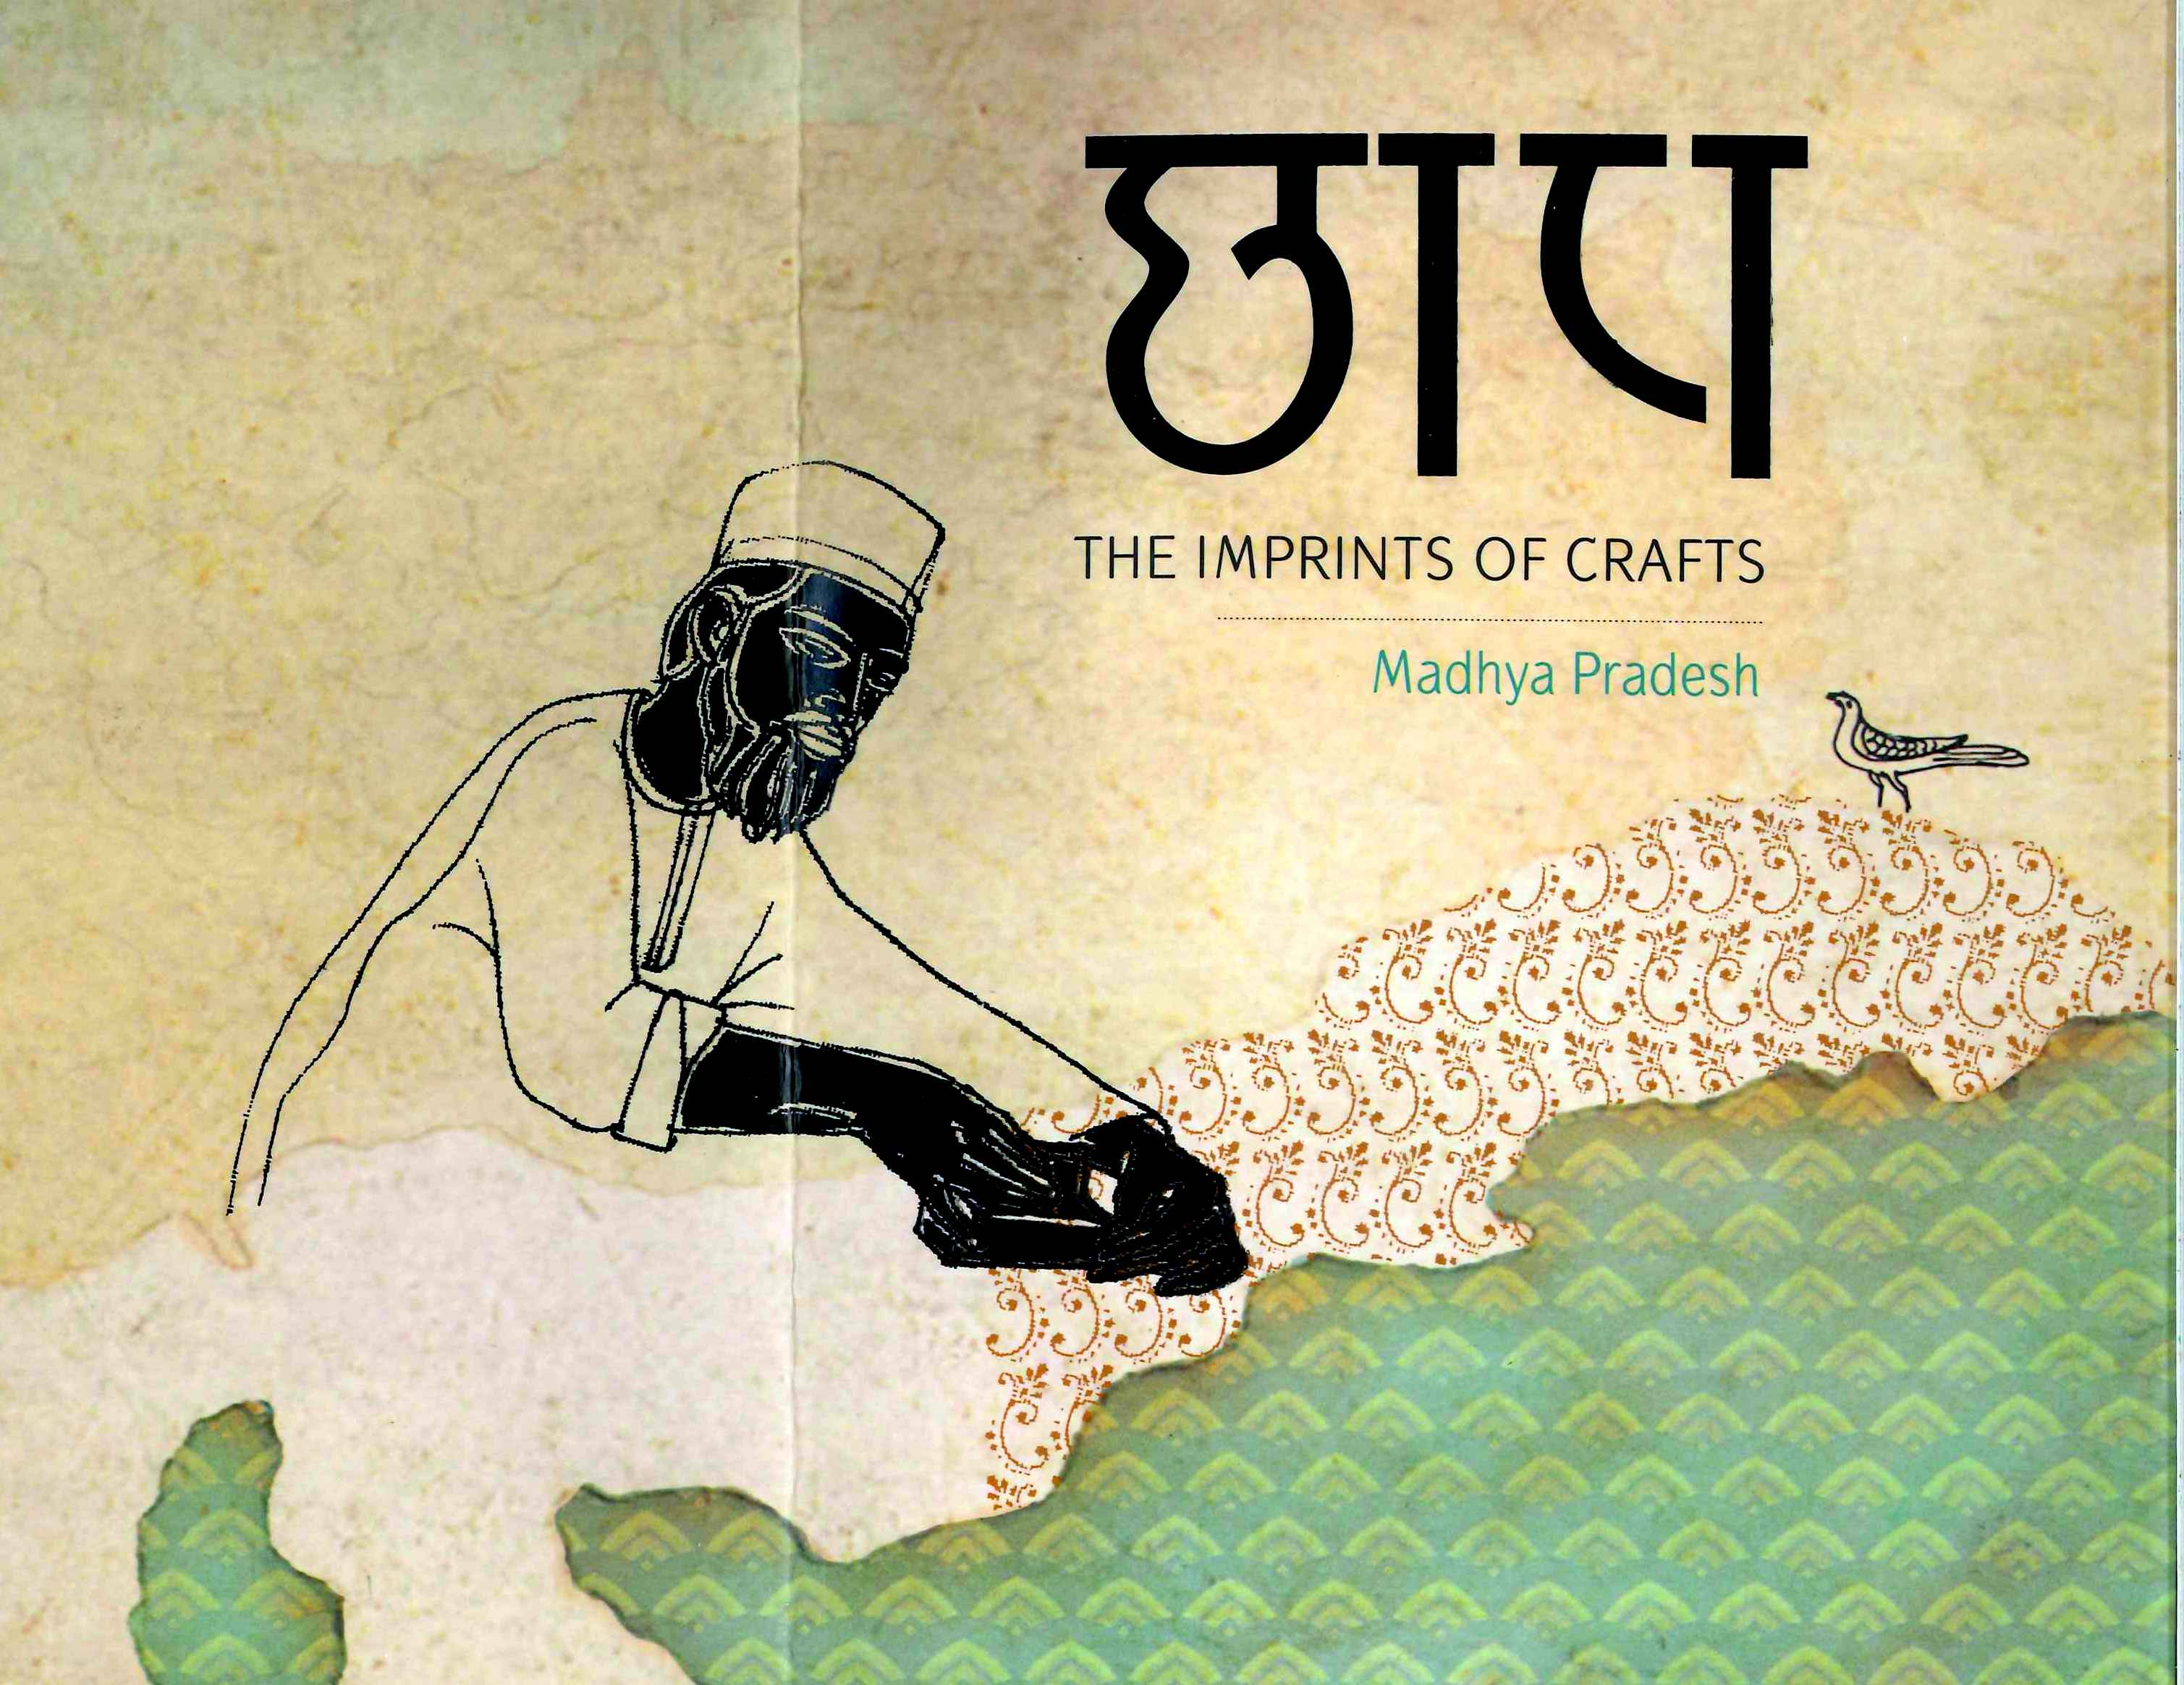 Crafts of Madhya Pradesh